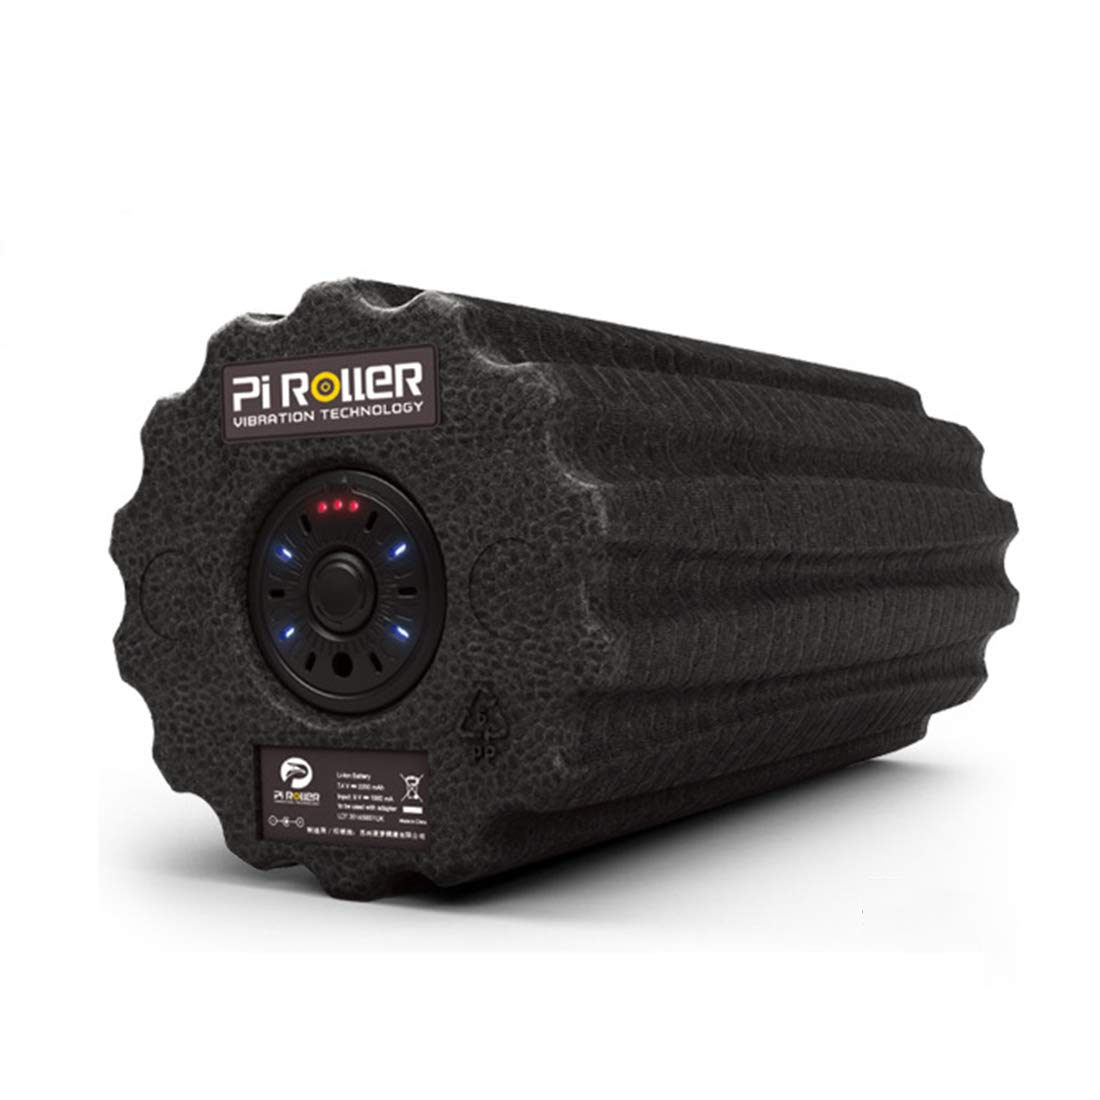 Longlong ヨガフォームローラーピラティスフィットネスヨガコラム電動振動マッサージブロック4ギア位置調整可能なマッサージ緩和筋肉疲労 (色 : 黒)  黒 B07SKNW9R7